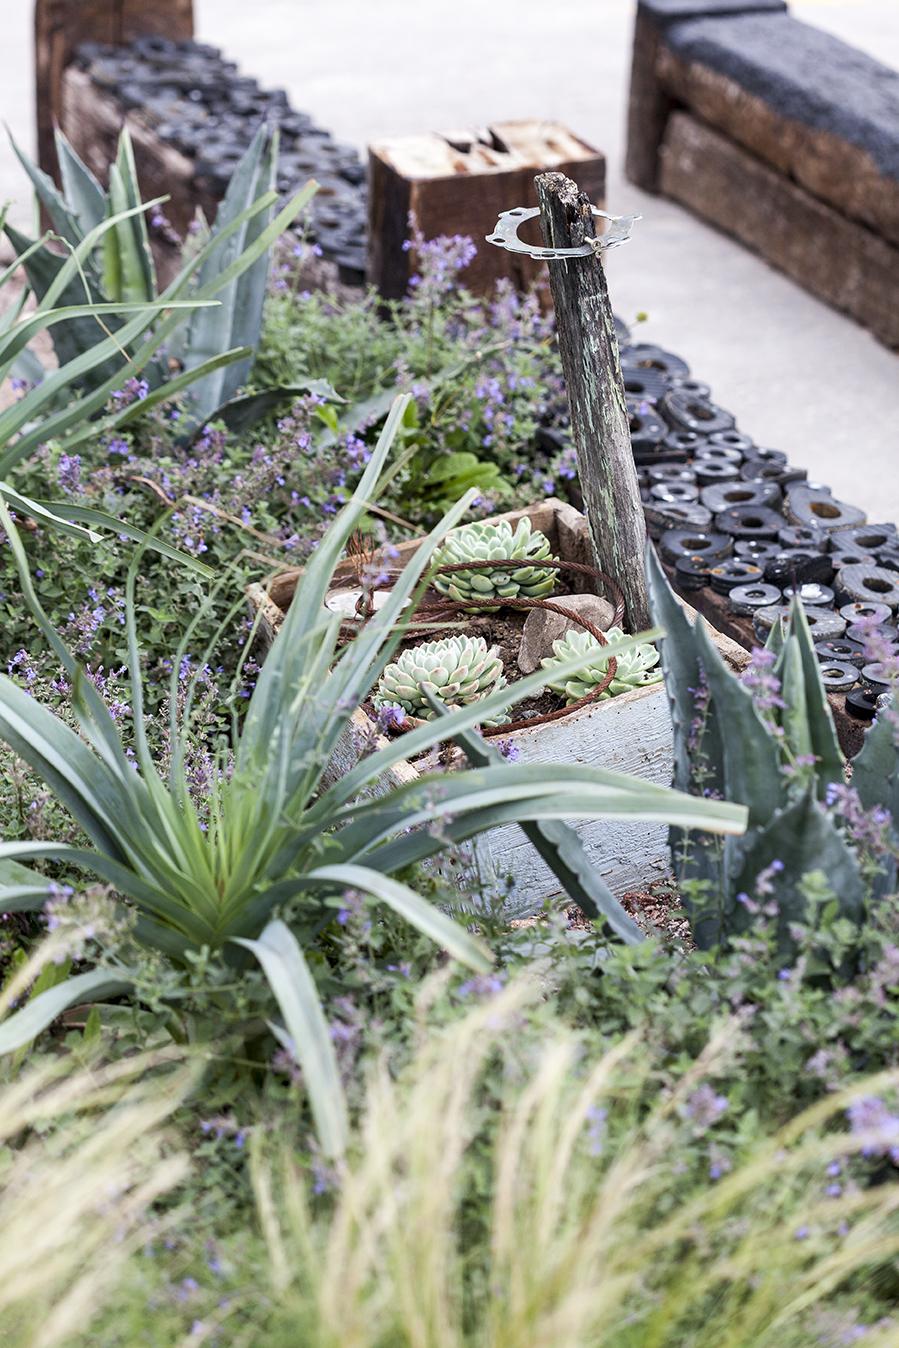 Propagating Dan Garden Design Franks Peckham